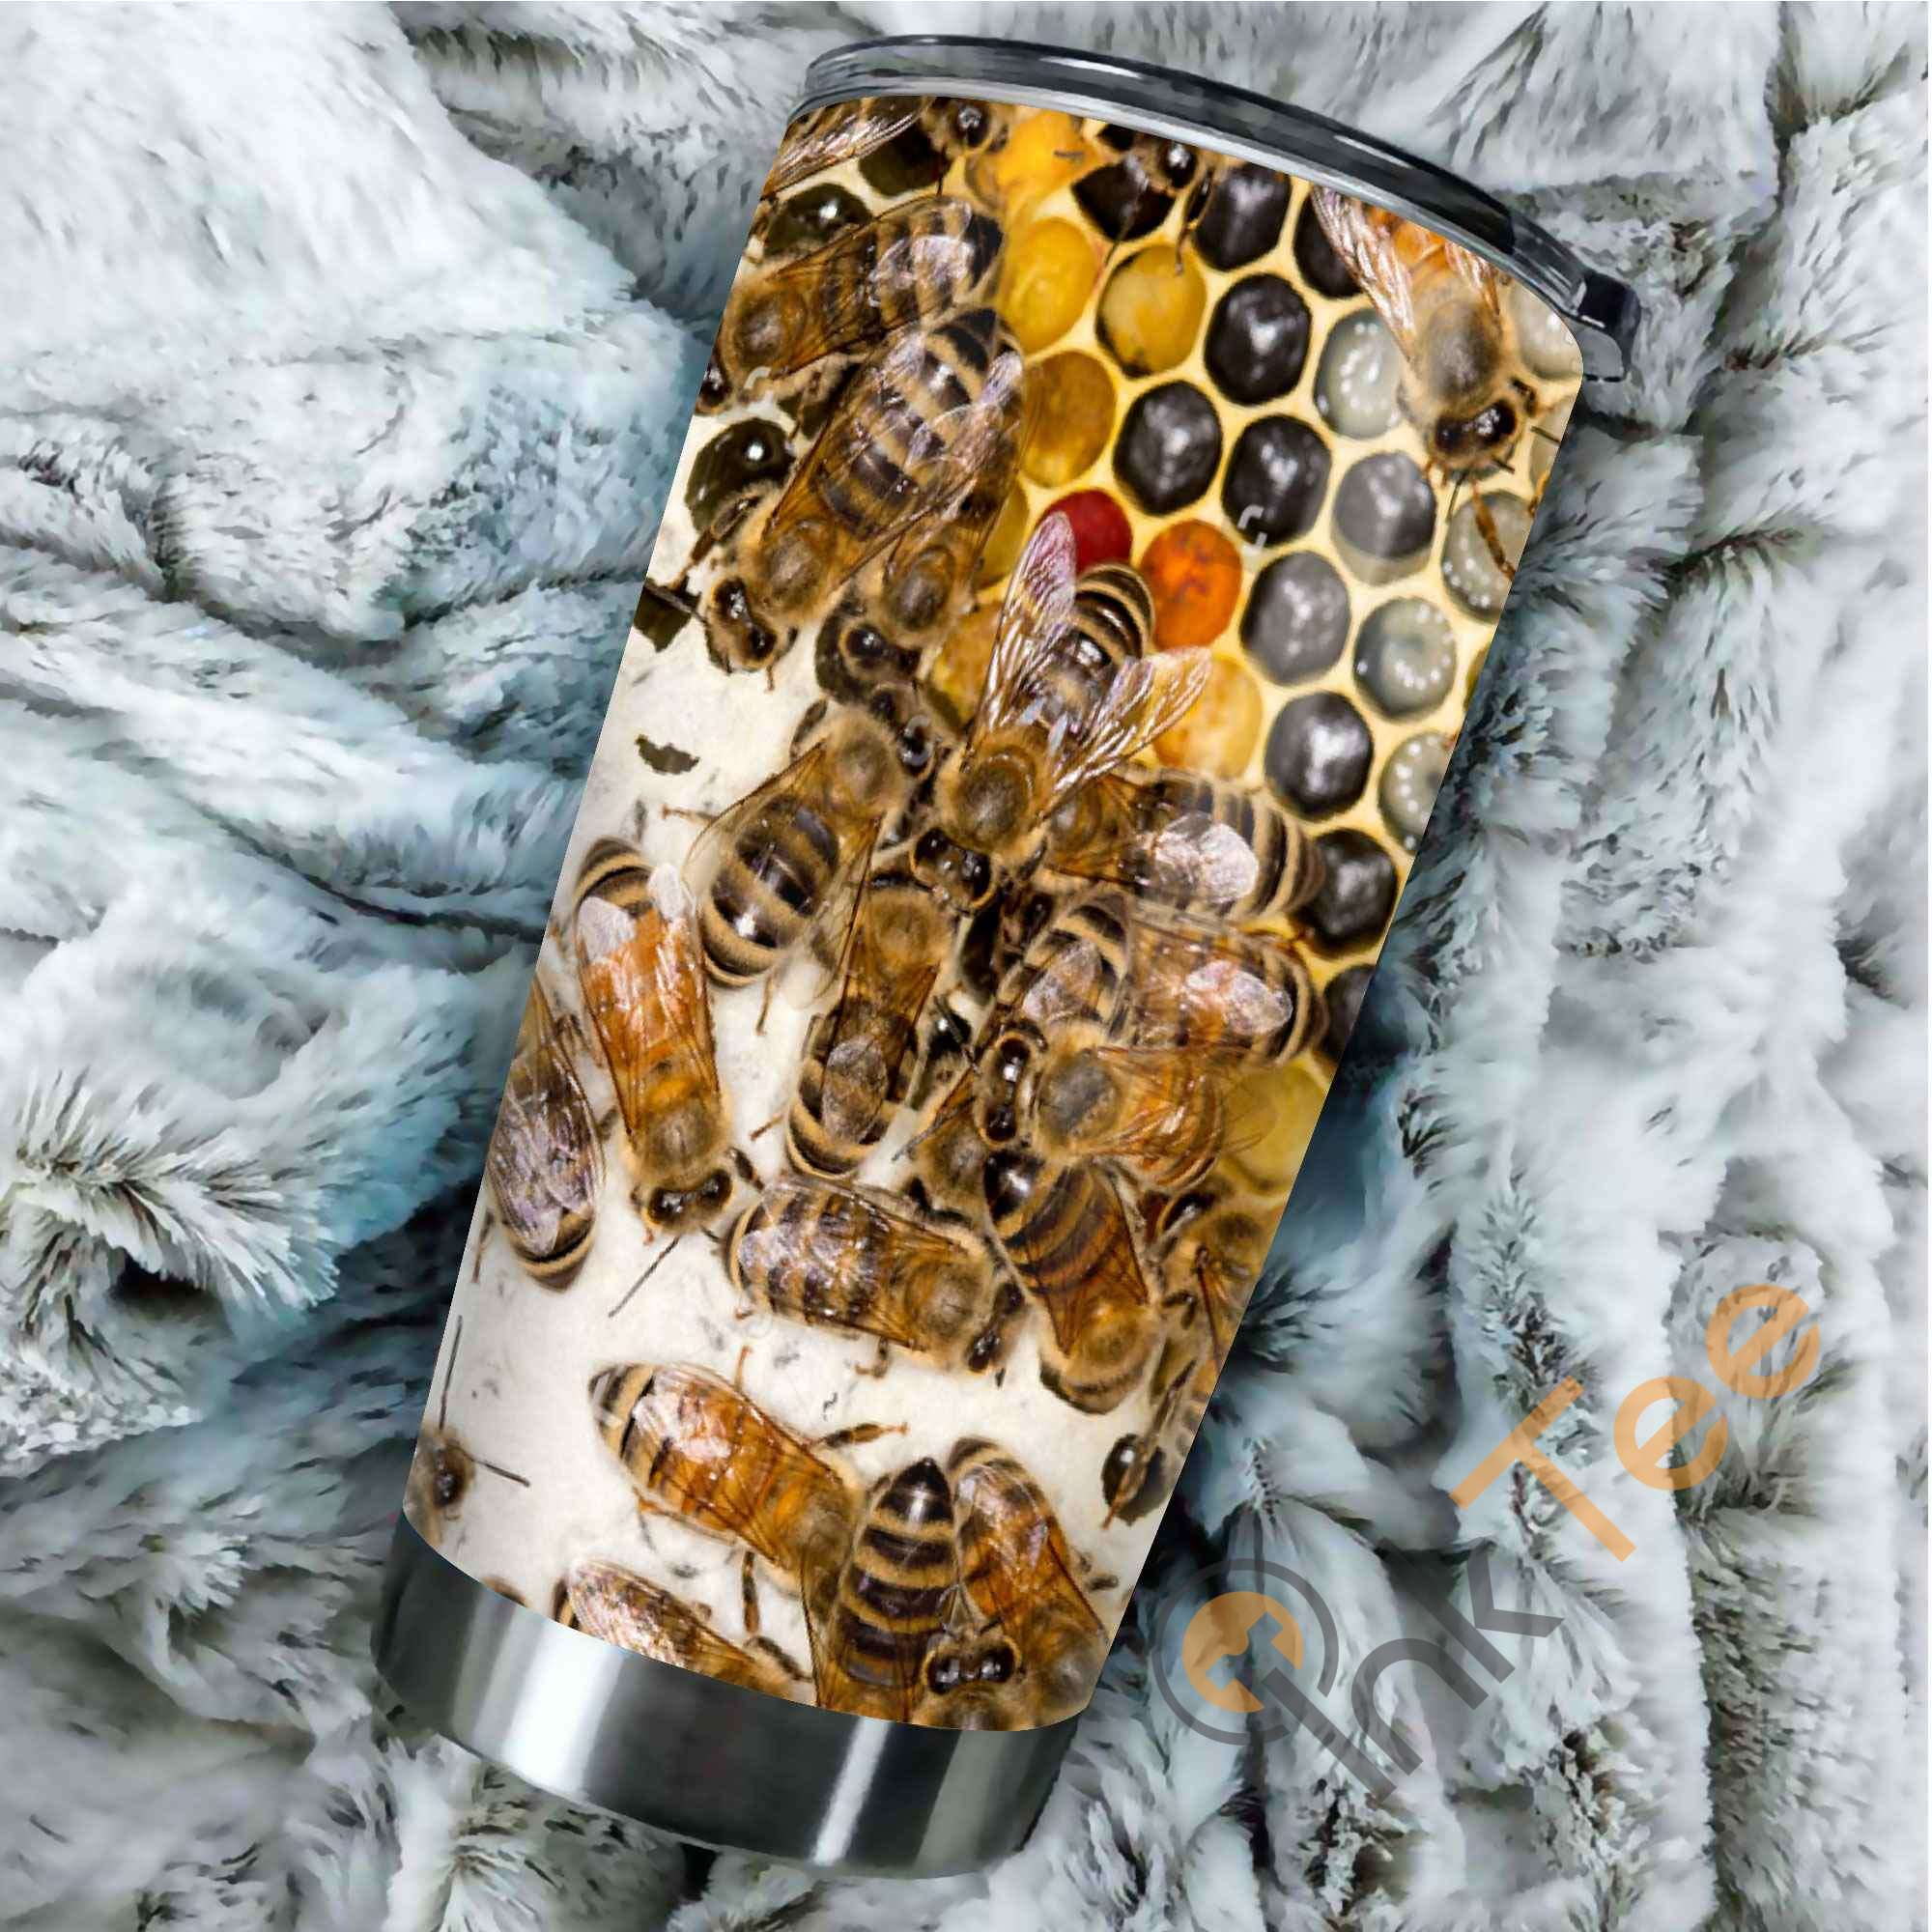 Bees Hive Amazon Best Seller Sku 3450 Stainless Steel Tumbler